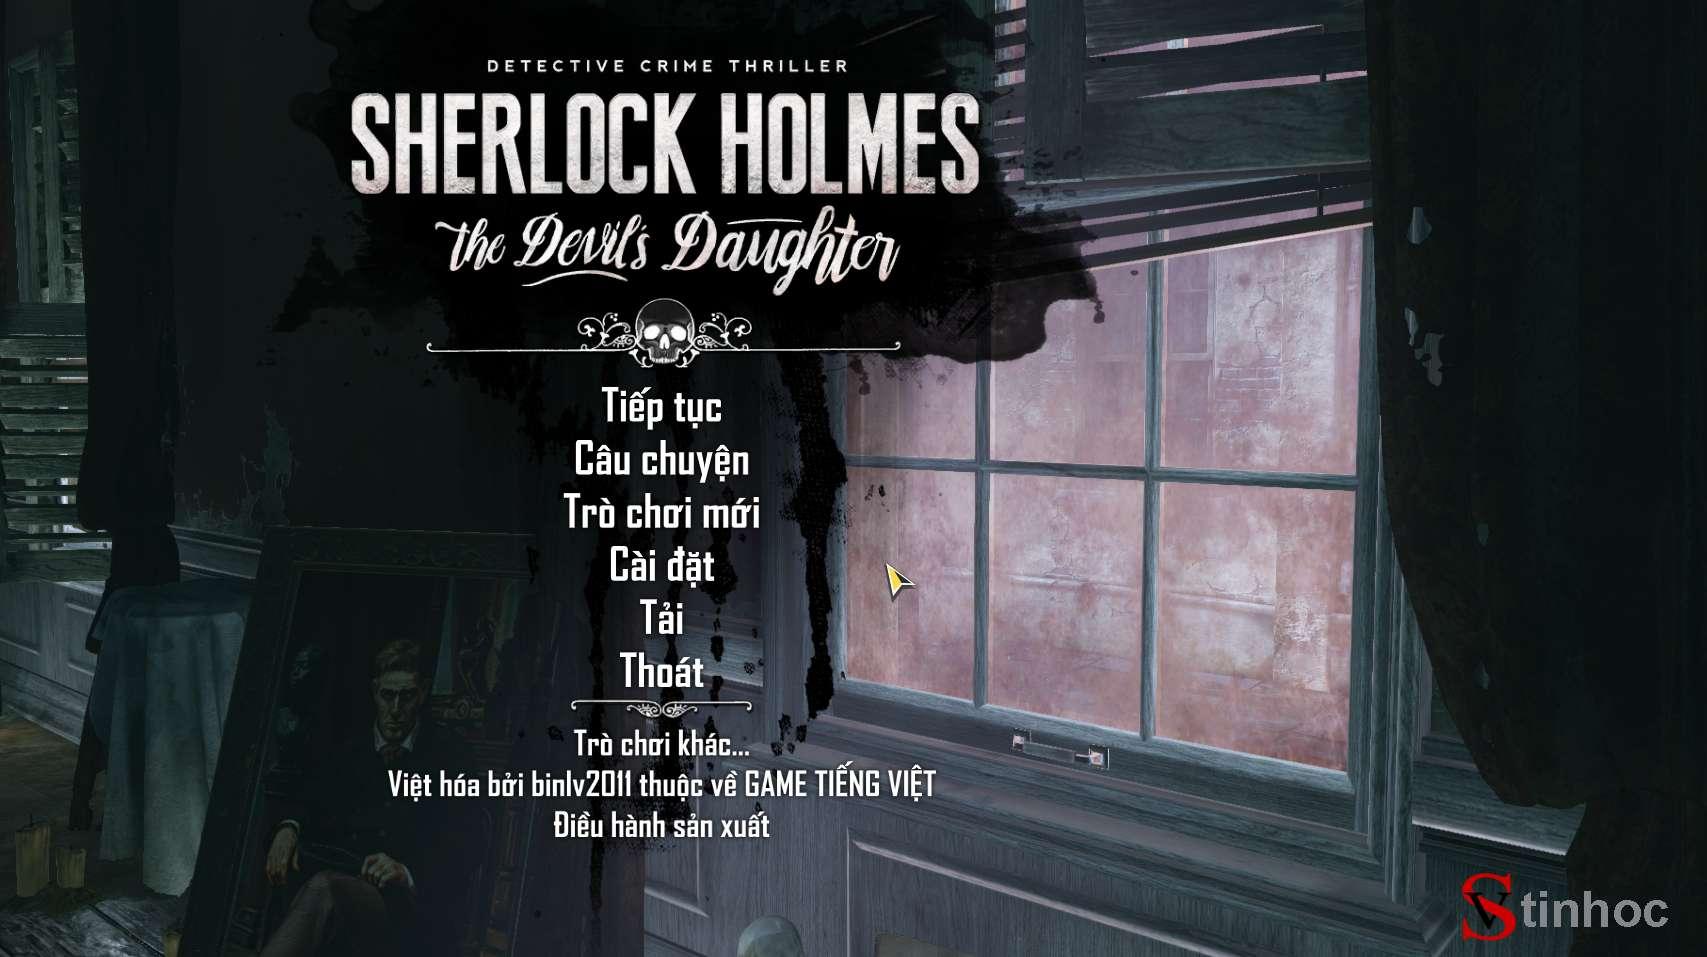 [PC] Sherlock Holmes: The Devil's Daughter Việt Hóa